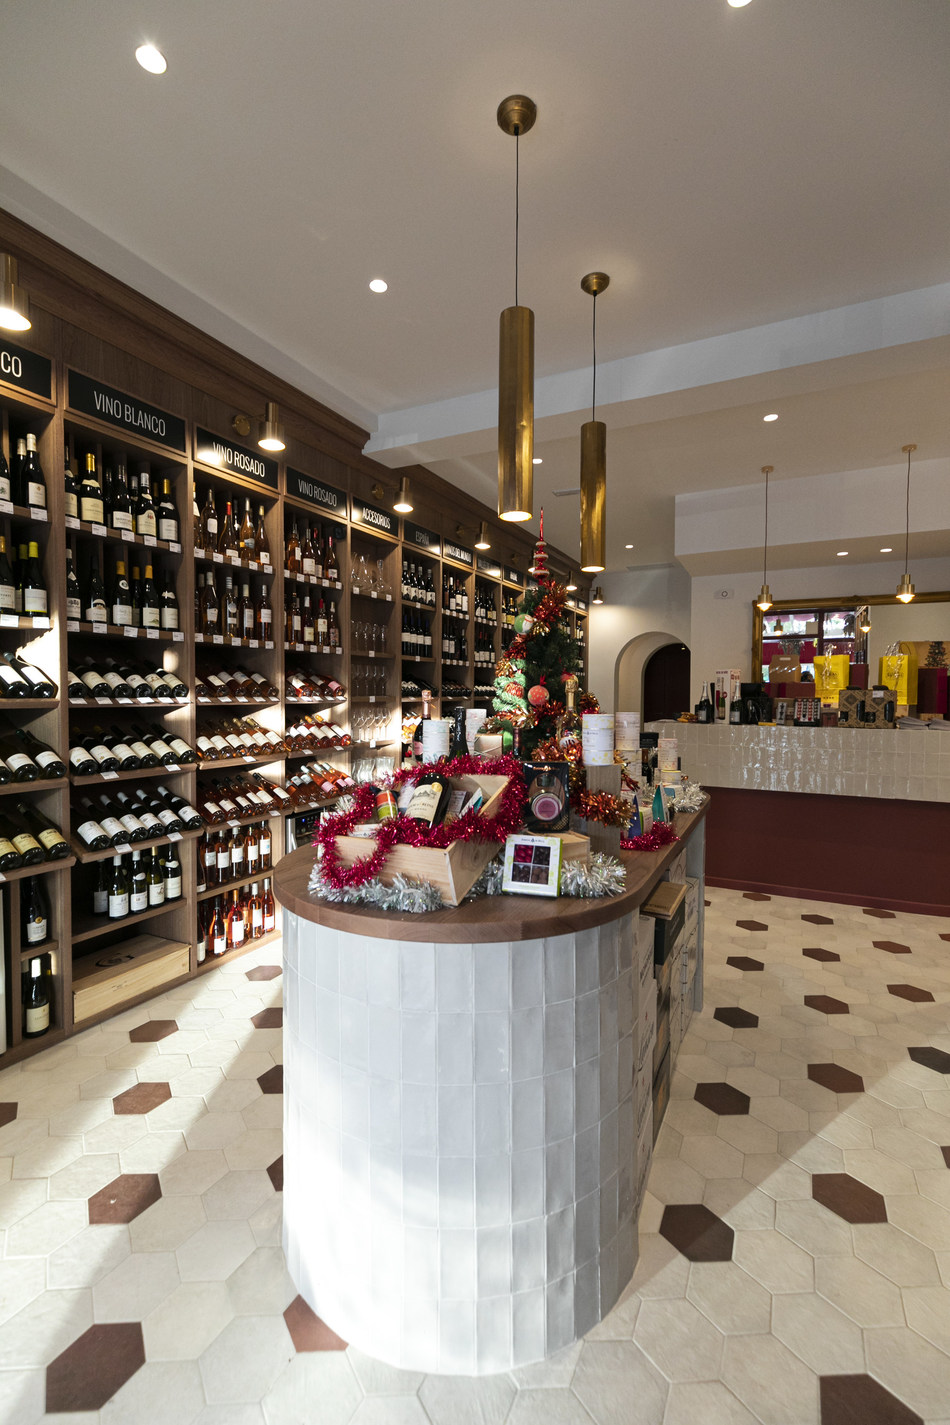 Franchise Nicolas new store (PRNewsfoto/NICOLAS)